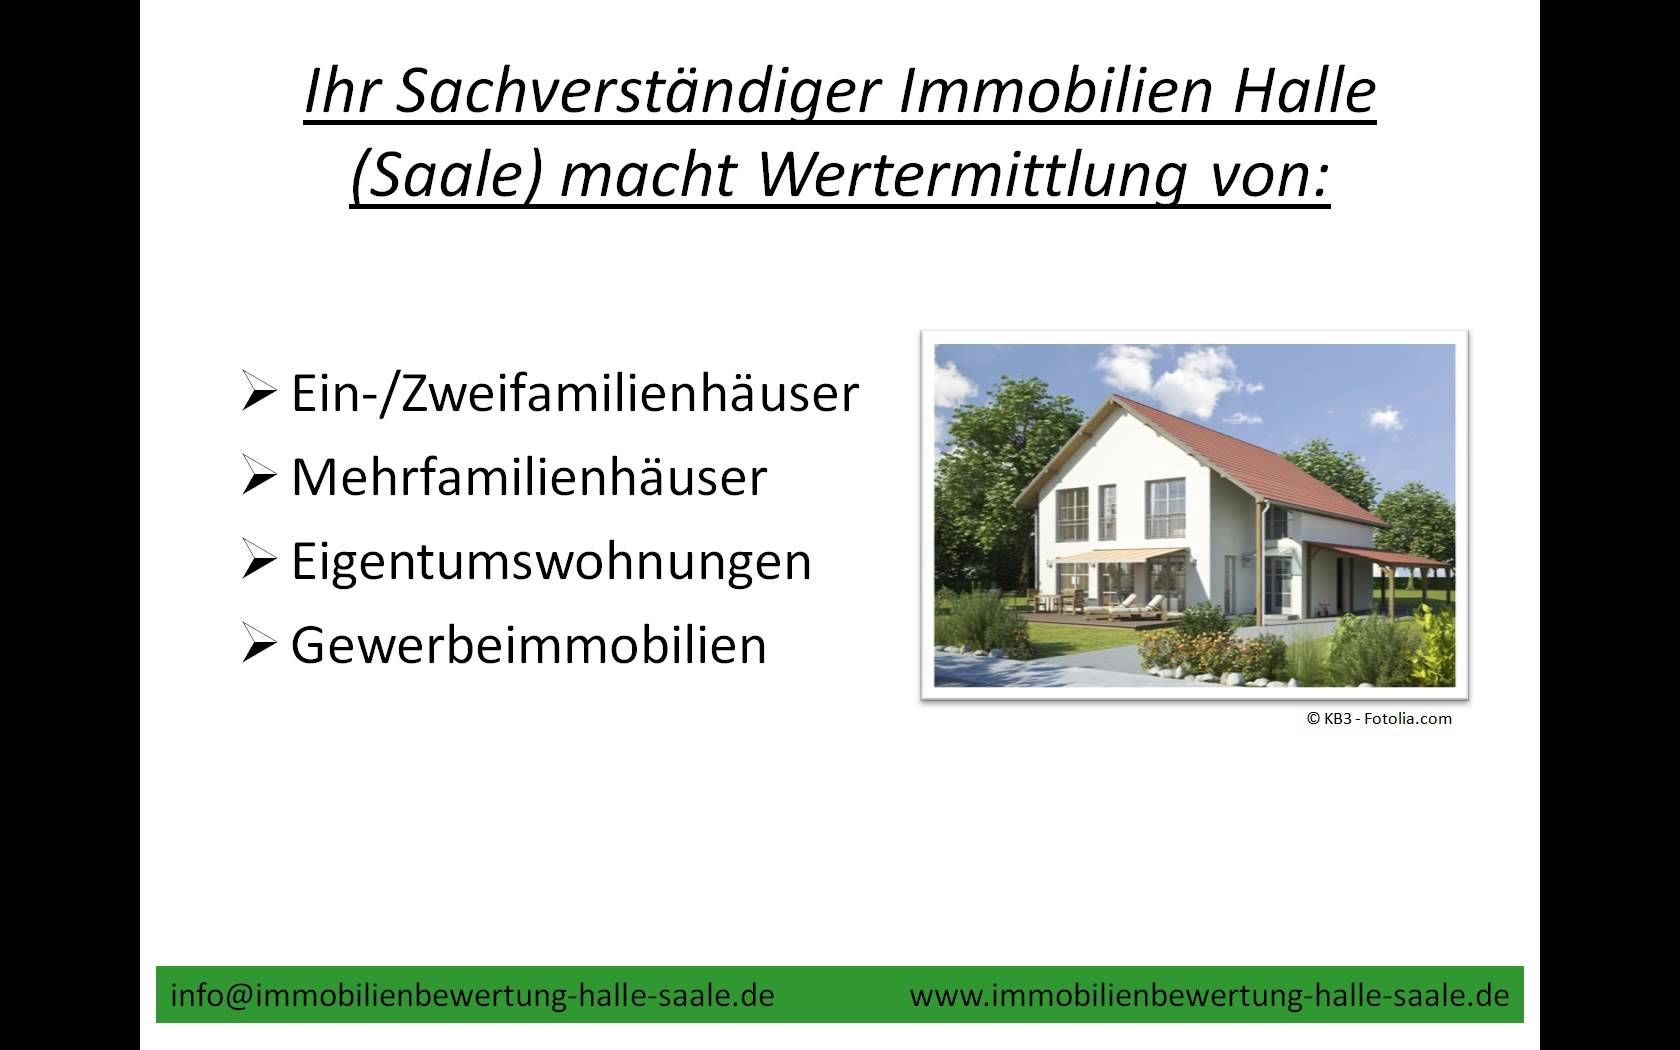 Sachverstandiger Immobilien Halle Saale Tel 034521389571 Immobilienbewertung Erstellen Lassen Immobilienbewertung Immobilien Magdeburg